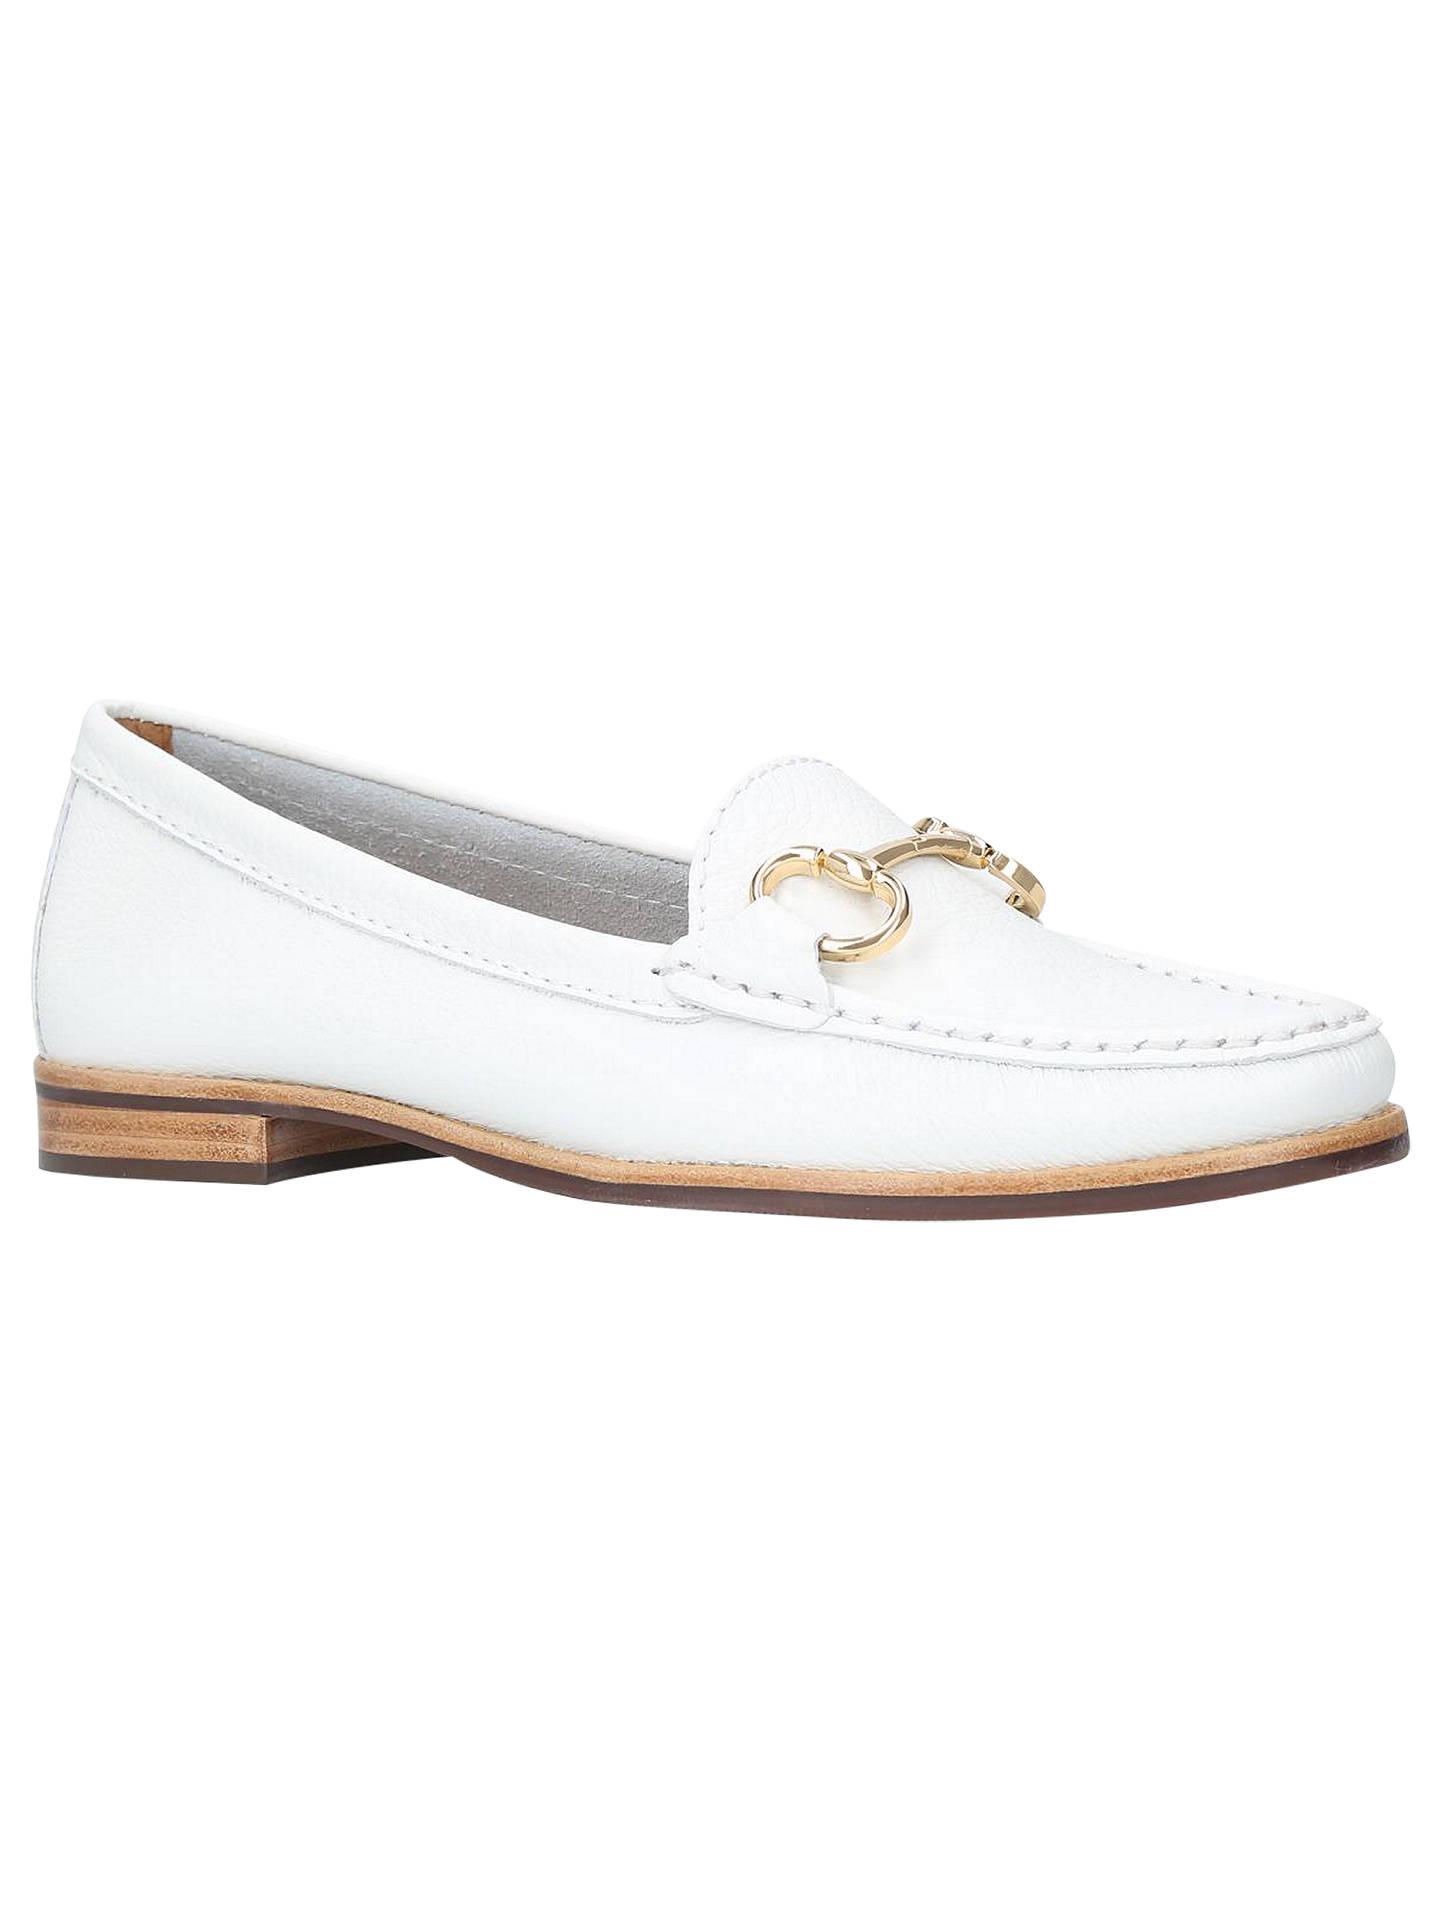 218962674cb62 Buy Carvela Comfort Click 2 Loafers